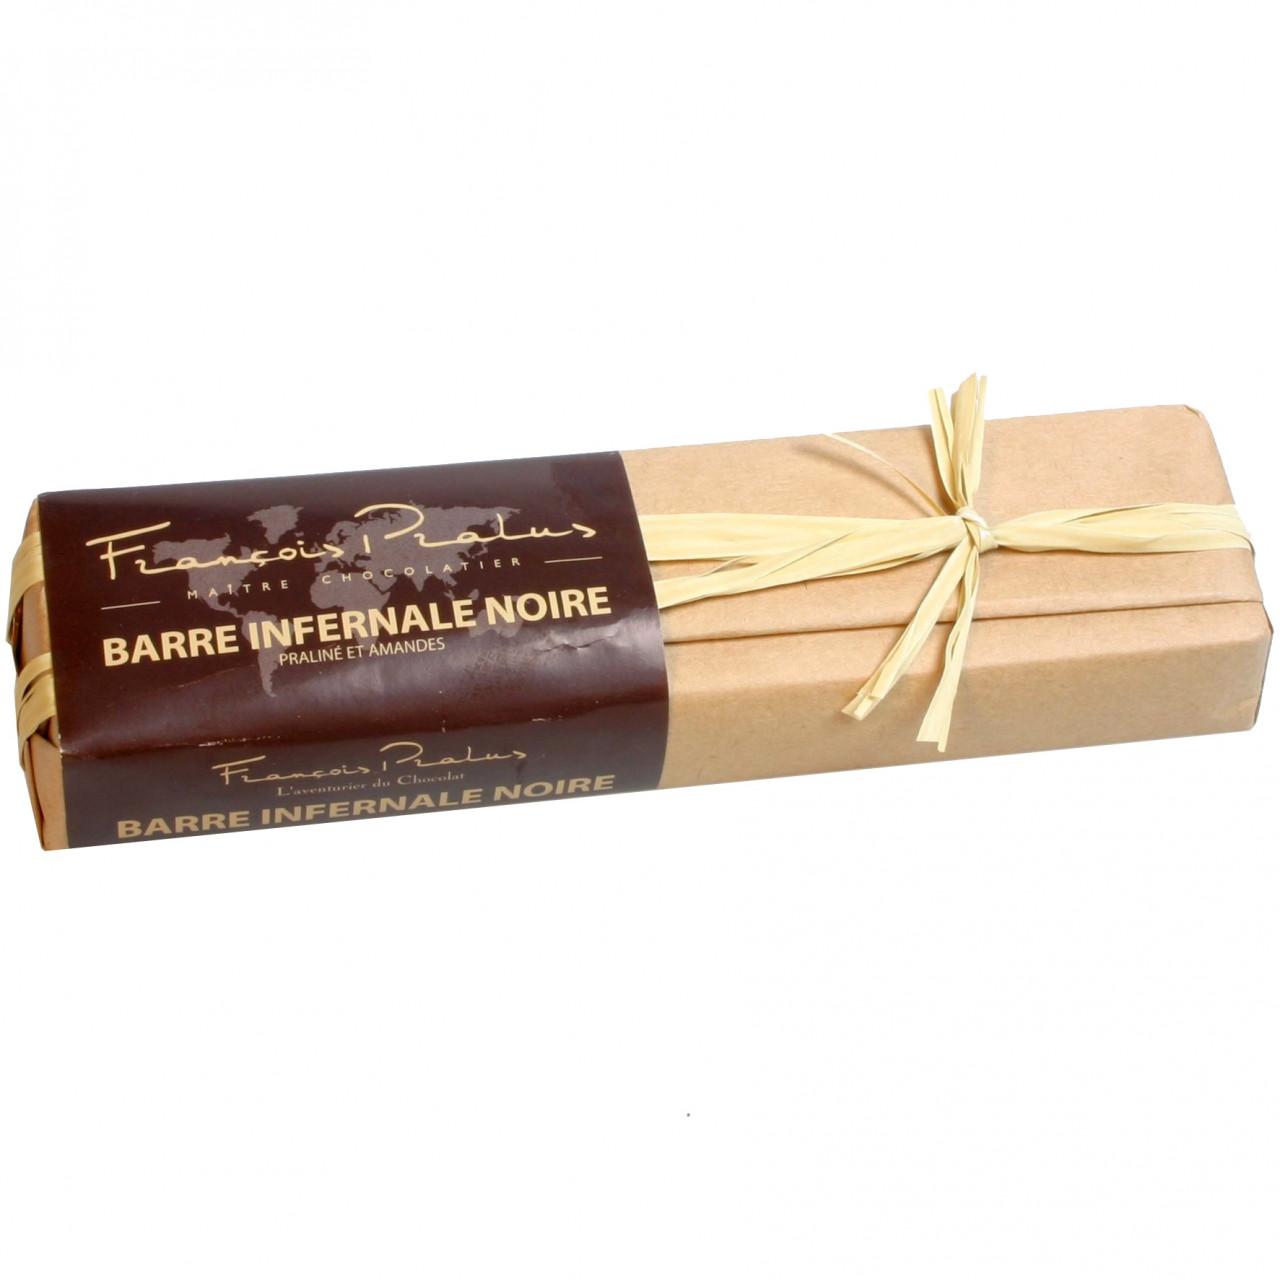 Sao Tomé, gefüllte dunkle Schokolade, dark chocolate, chocolat noir, almonds, amandes, filled chocolate, - $seoKeywords- Chocolats-De-Luxe